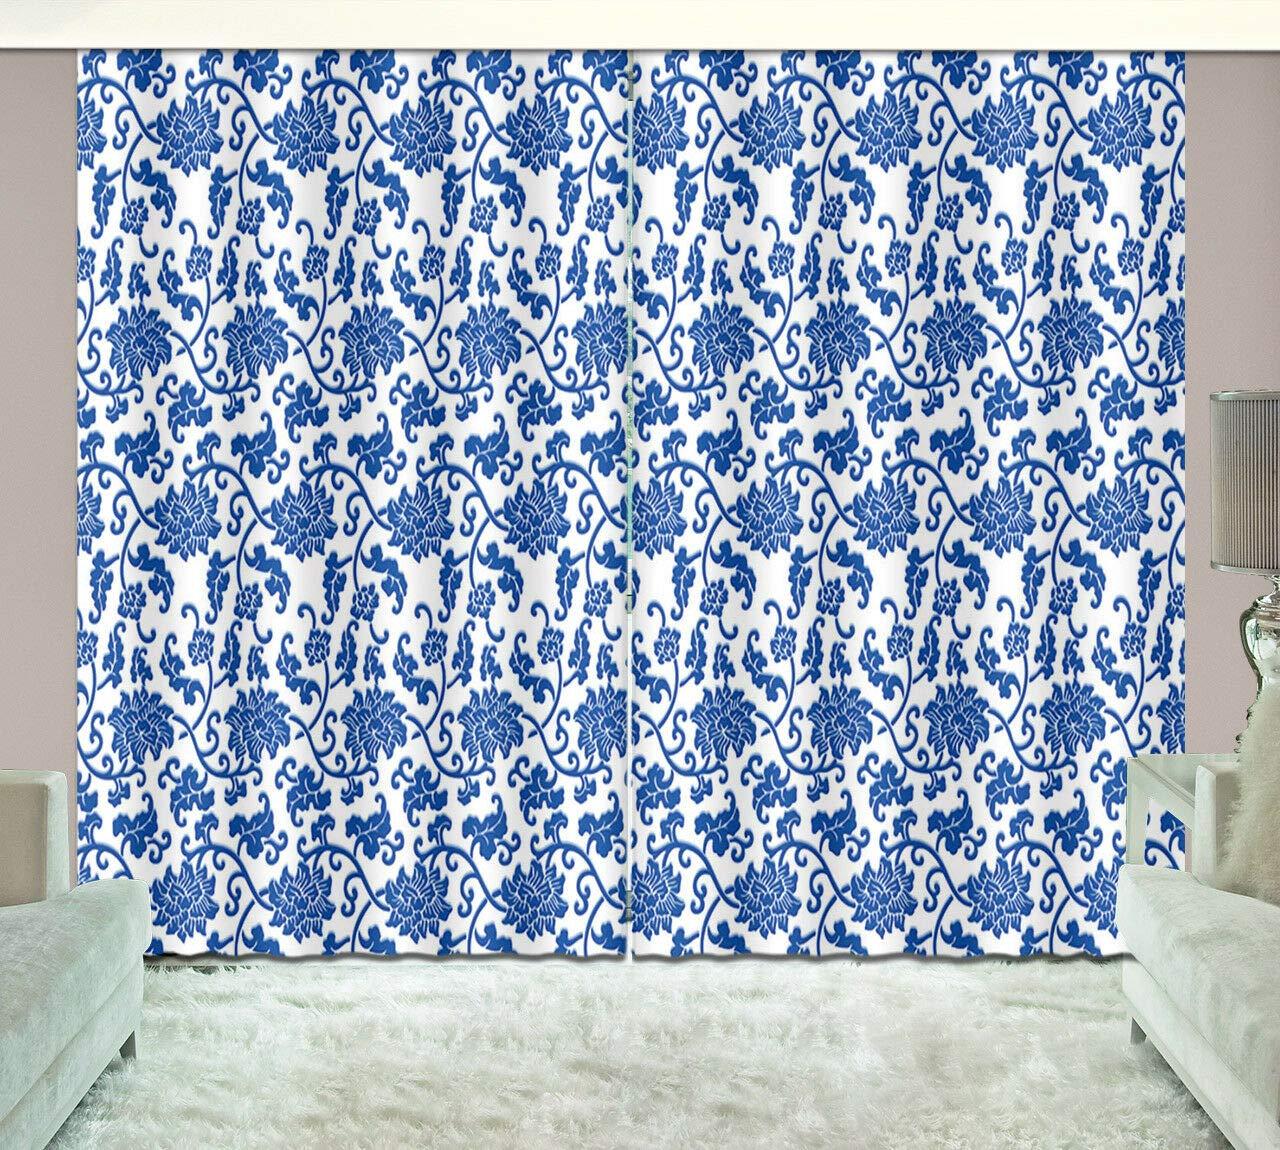 2 Panels China porcelain texture Window Fabric Curtain Drapes Darkening Blockout